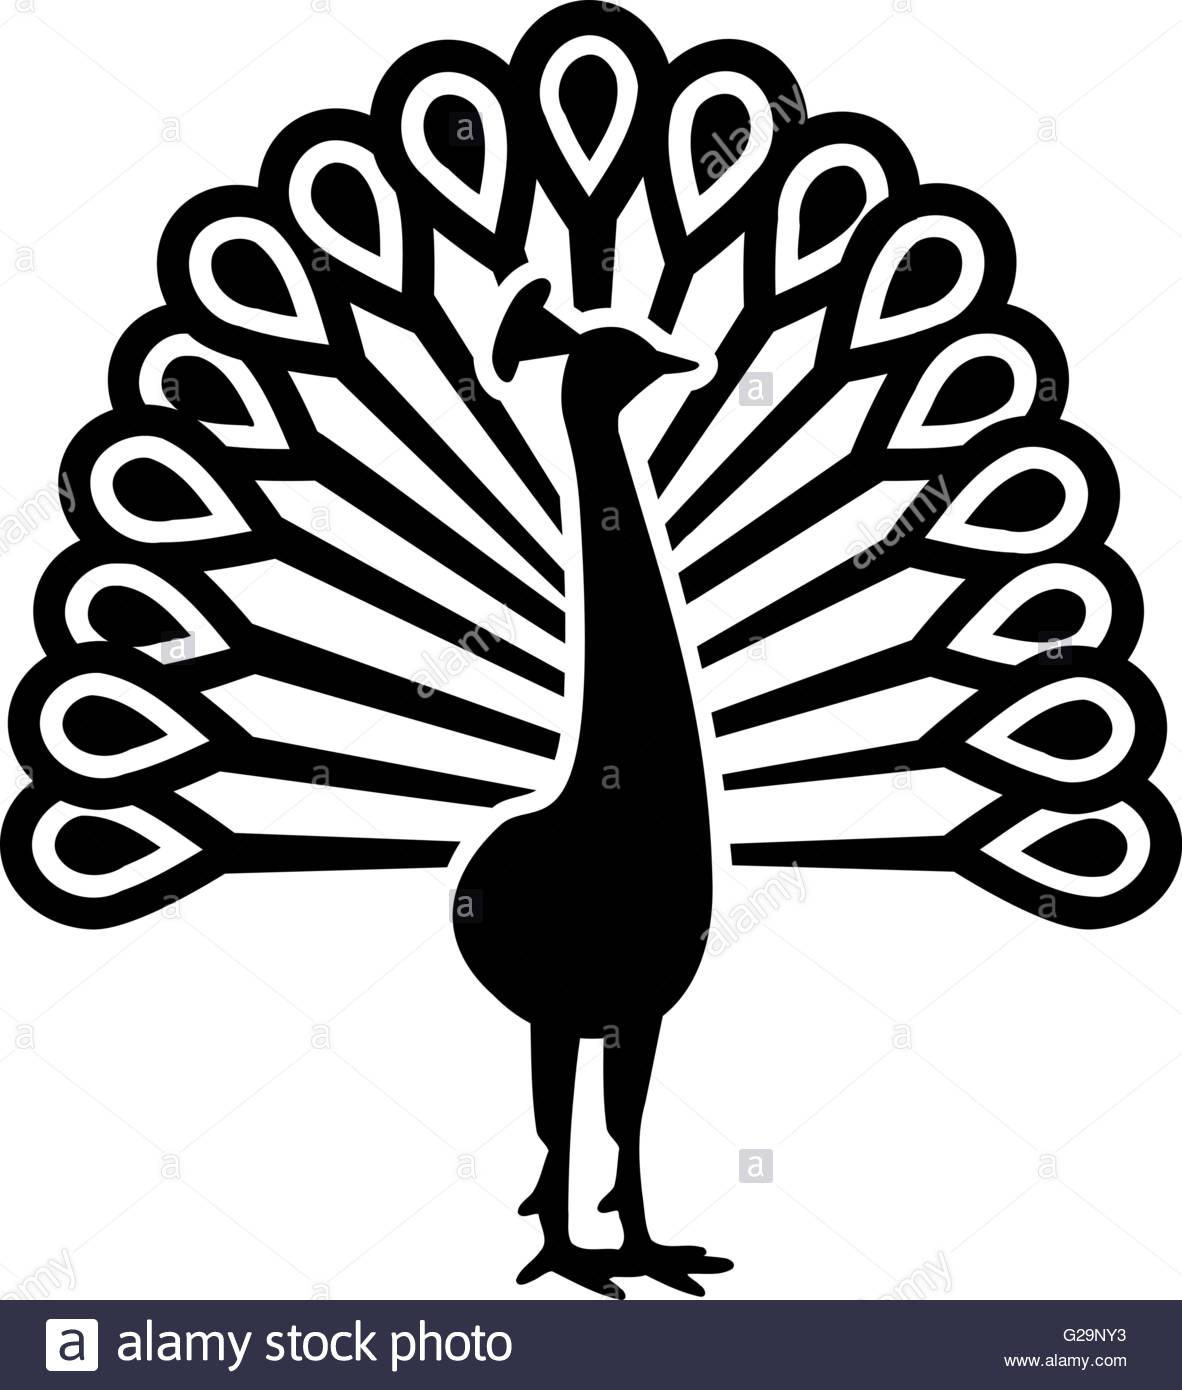 1182x1390 Beautiful Peacock Symbol Stock Vector Art Amp Illustration, Vector